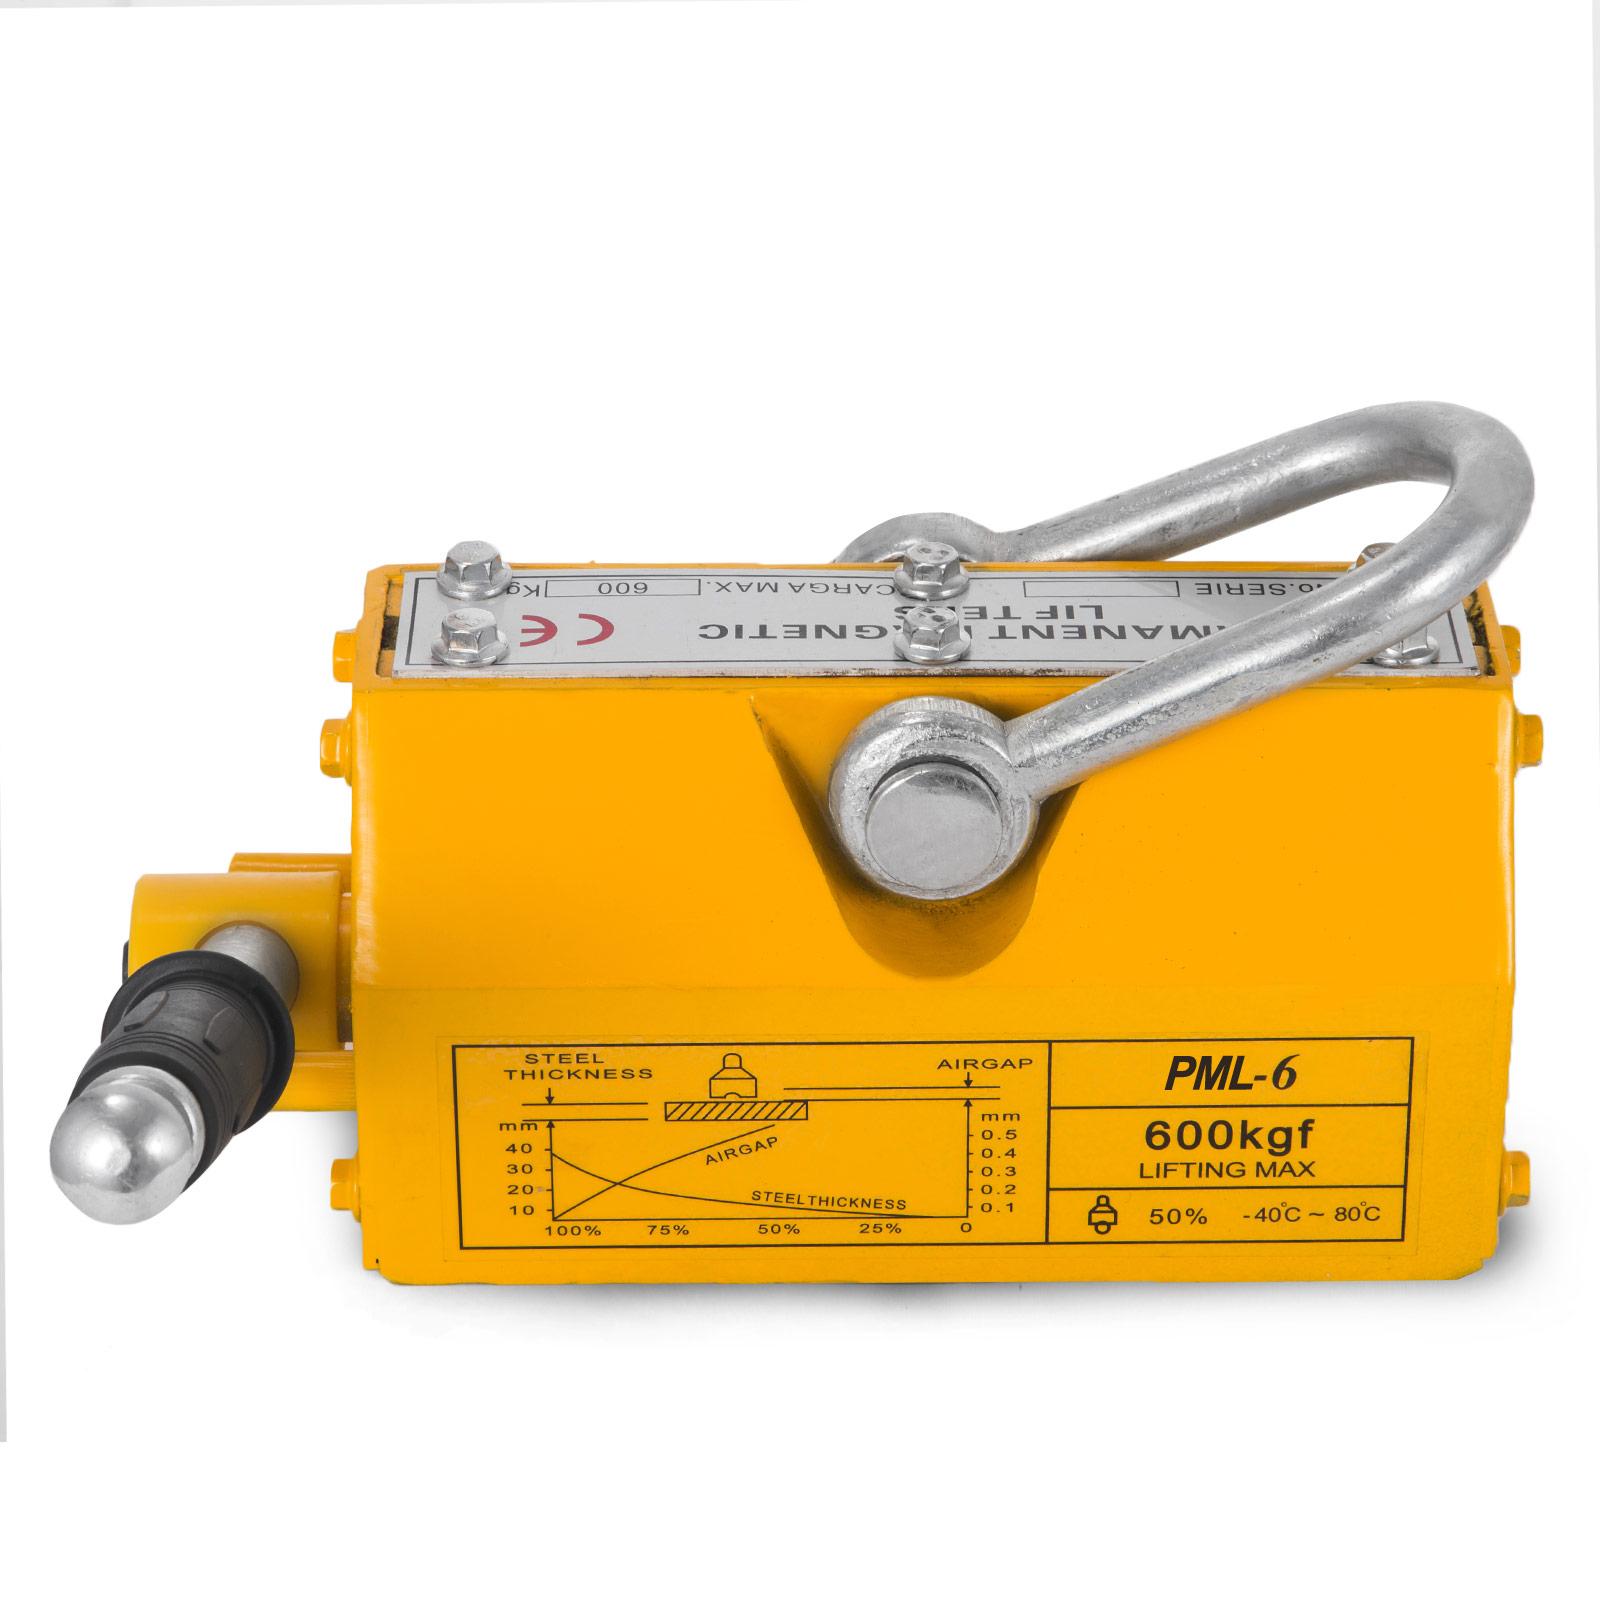 100-300-600-1000KG-Steel-Magnetic-Lifter-Heavy-Duty-Crane-Hoist-Lifting-Magnet miniature 53